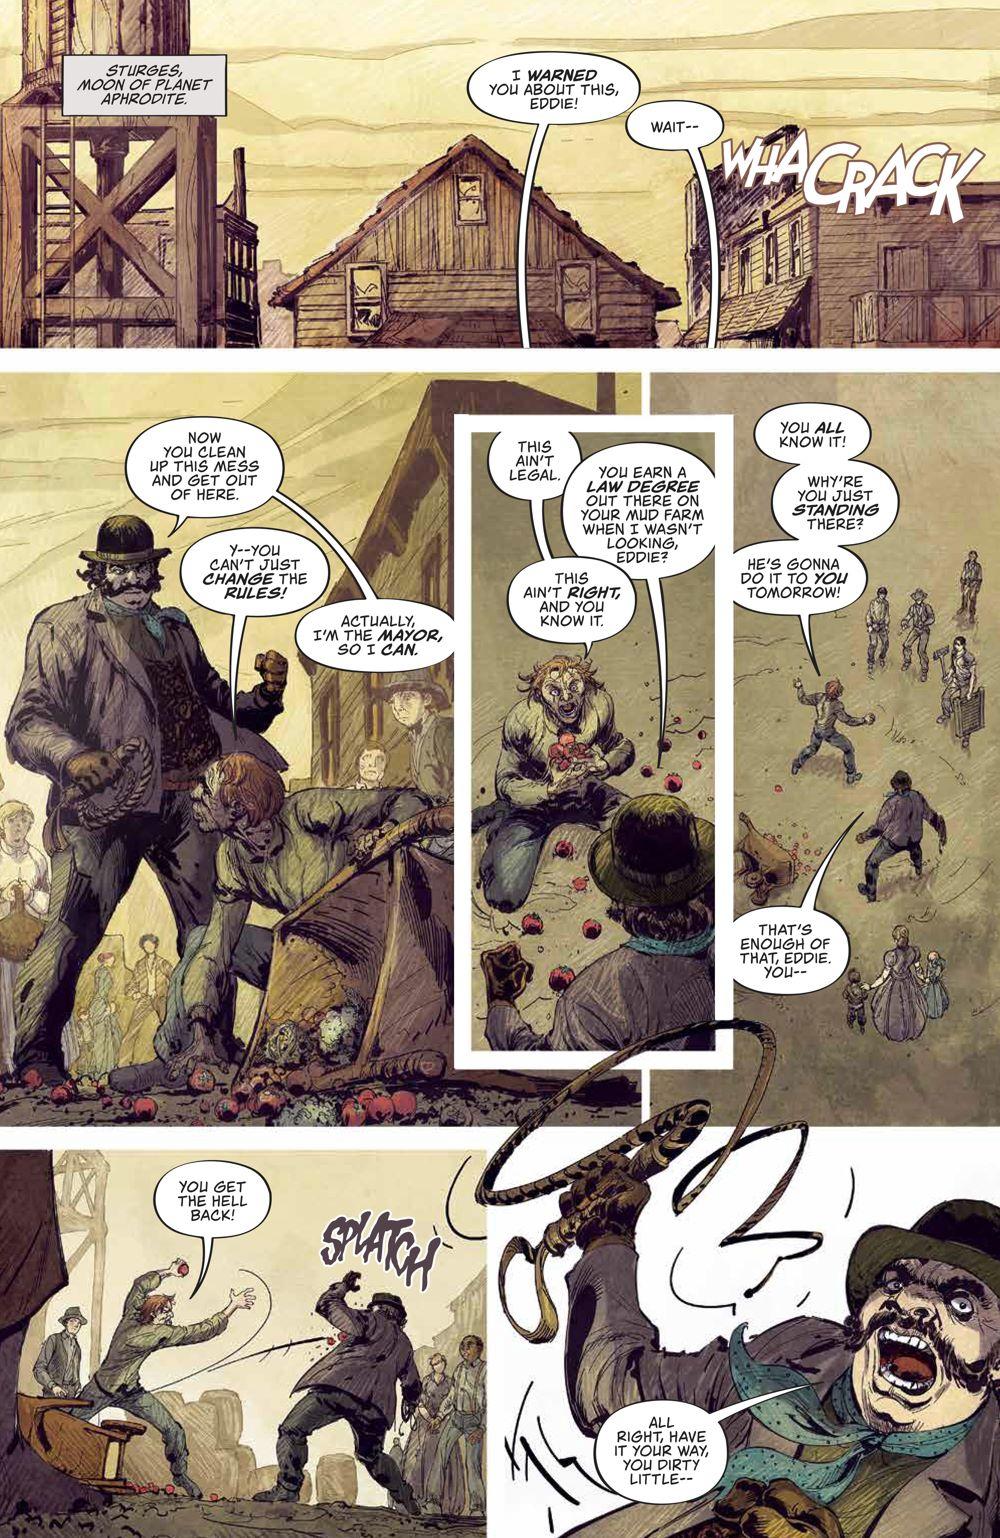 Firefly_NewSheriffVerse_v1_HC_PRESS_53 ComicList Previews: FIREFLY NEW SHERIFF IN THE 'VERSE VOLUME 1 HC